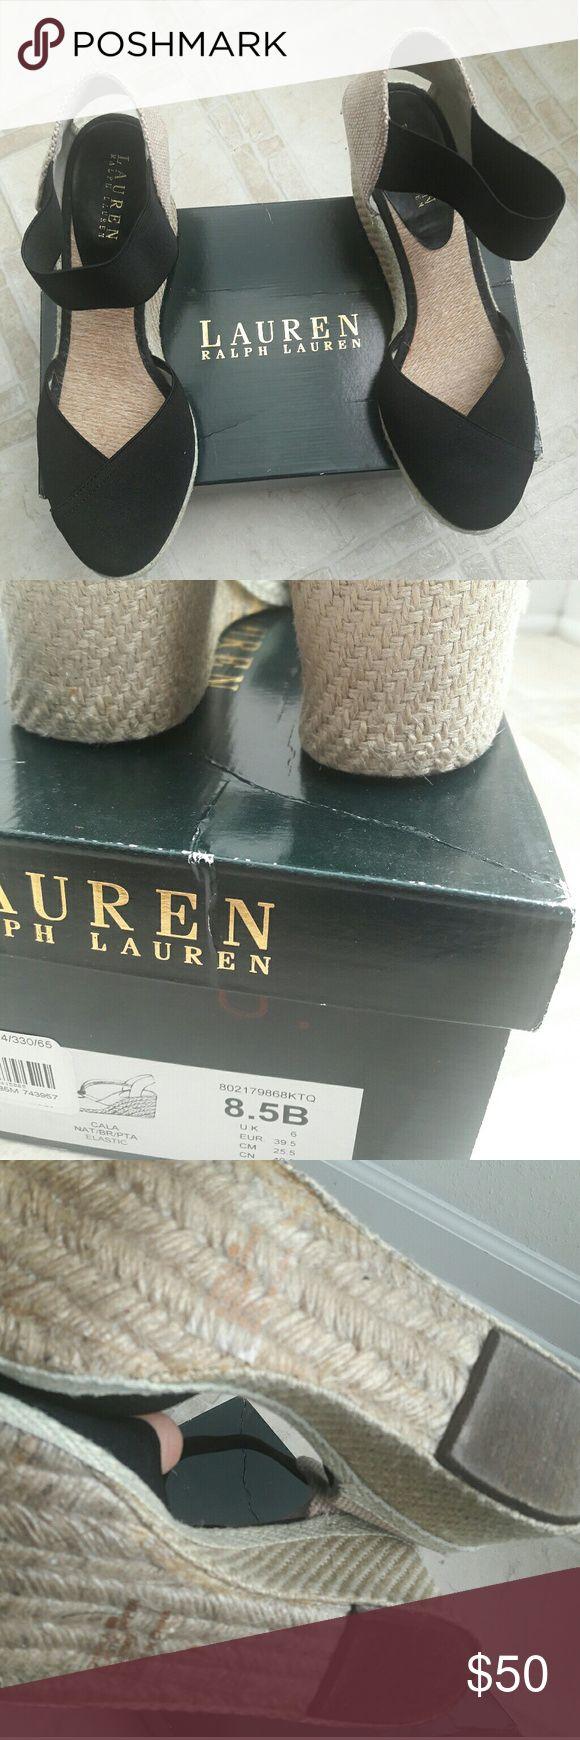 Ralph Lauren espadrilles shoe Never used with box. Ralph Lauren Shoes Espadrilles